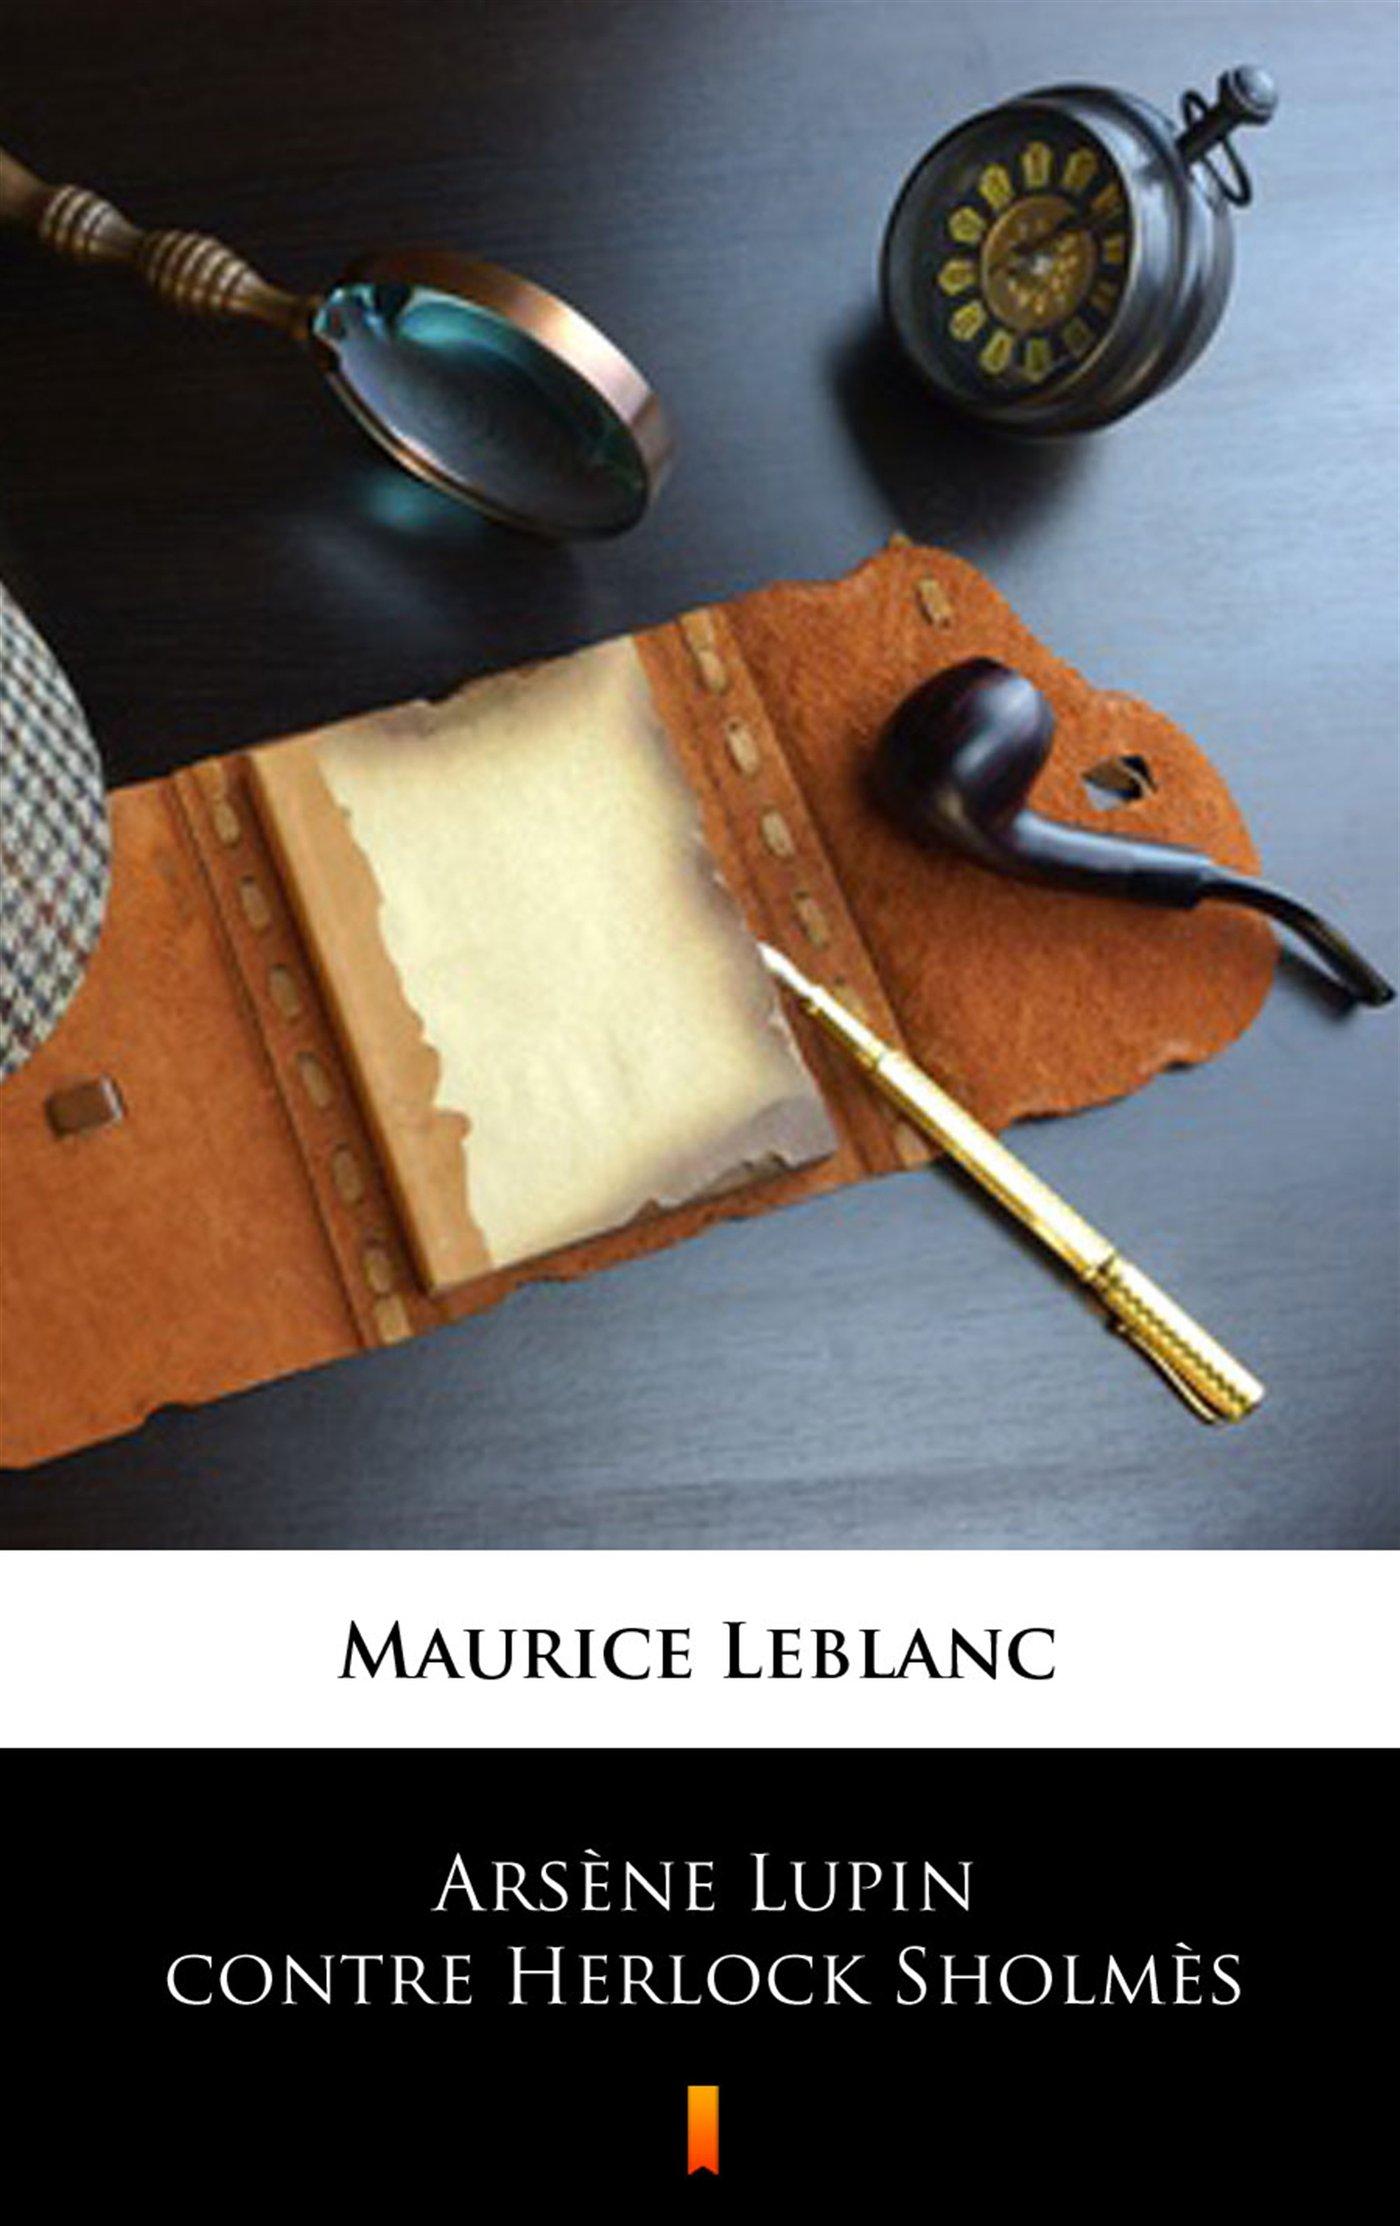 Arsene Lupin contre Herlock Sholmes - Ebook (Książka EPUB) do pobrania w formacie EPUB